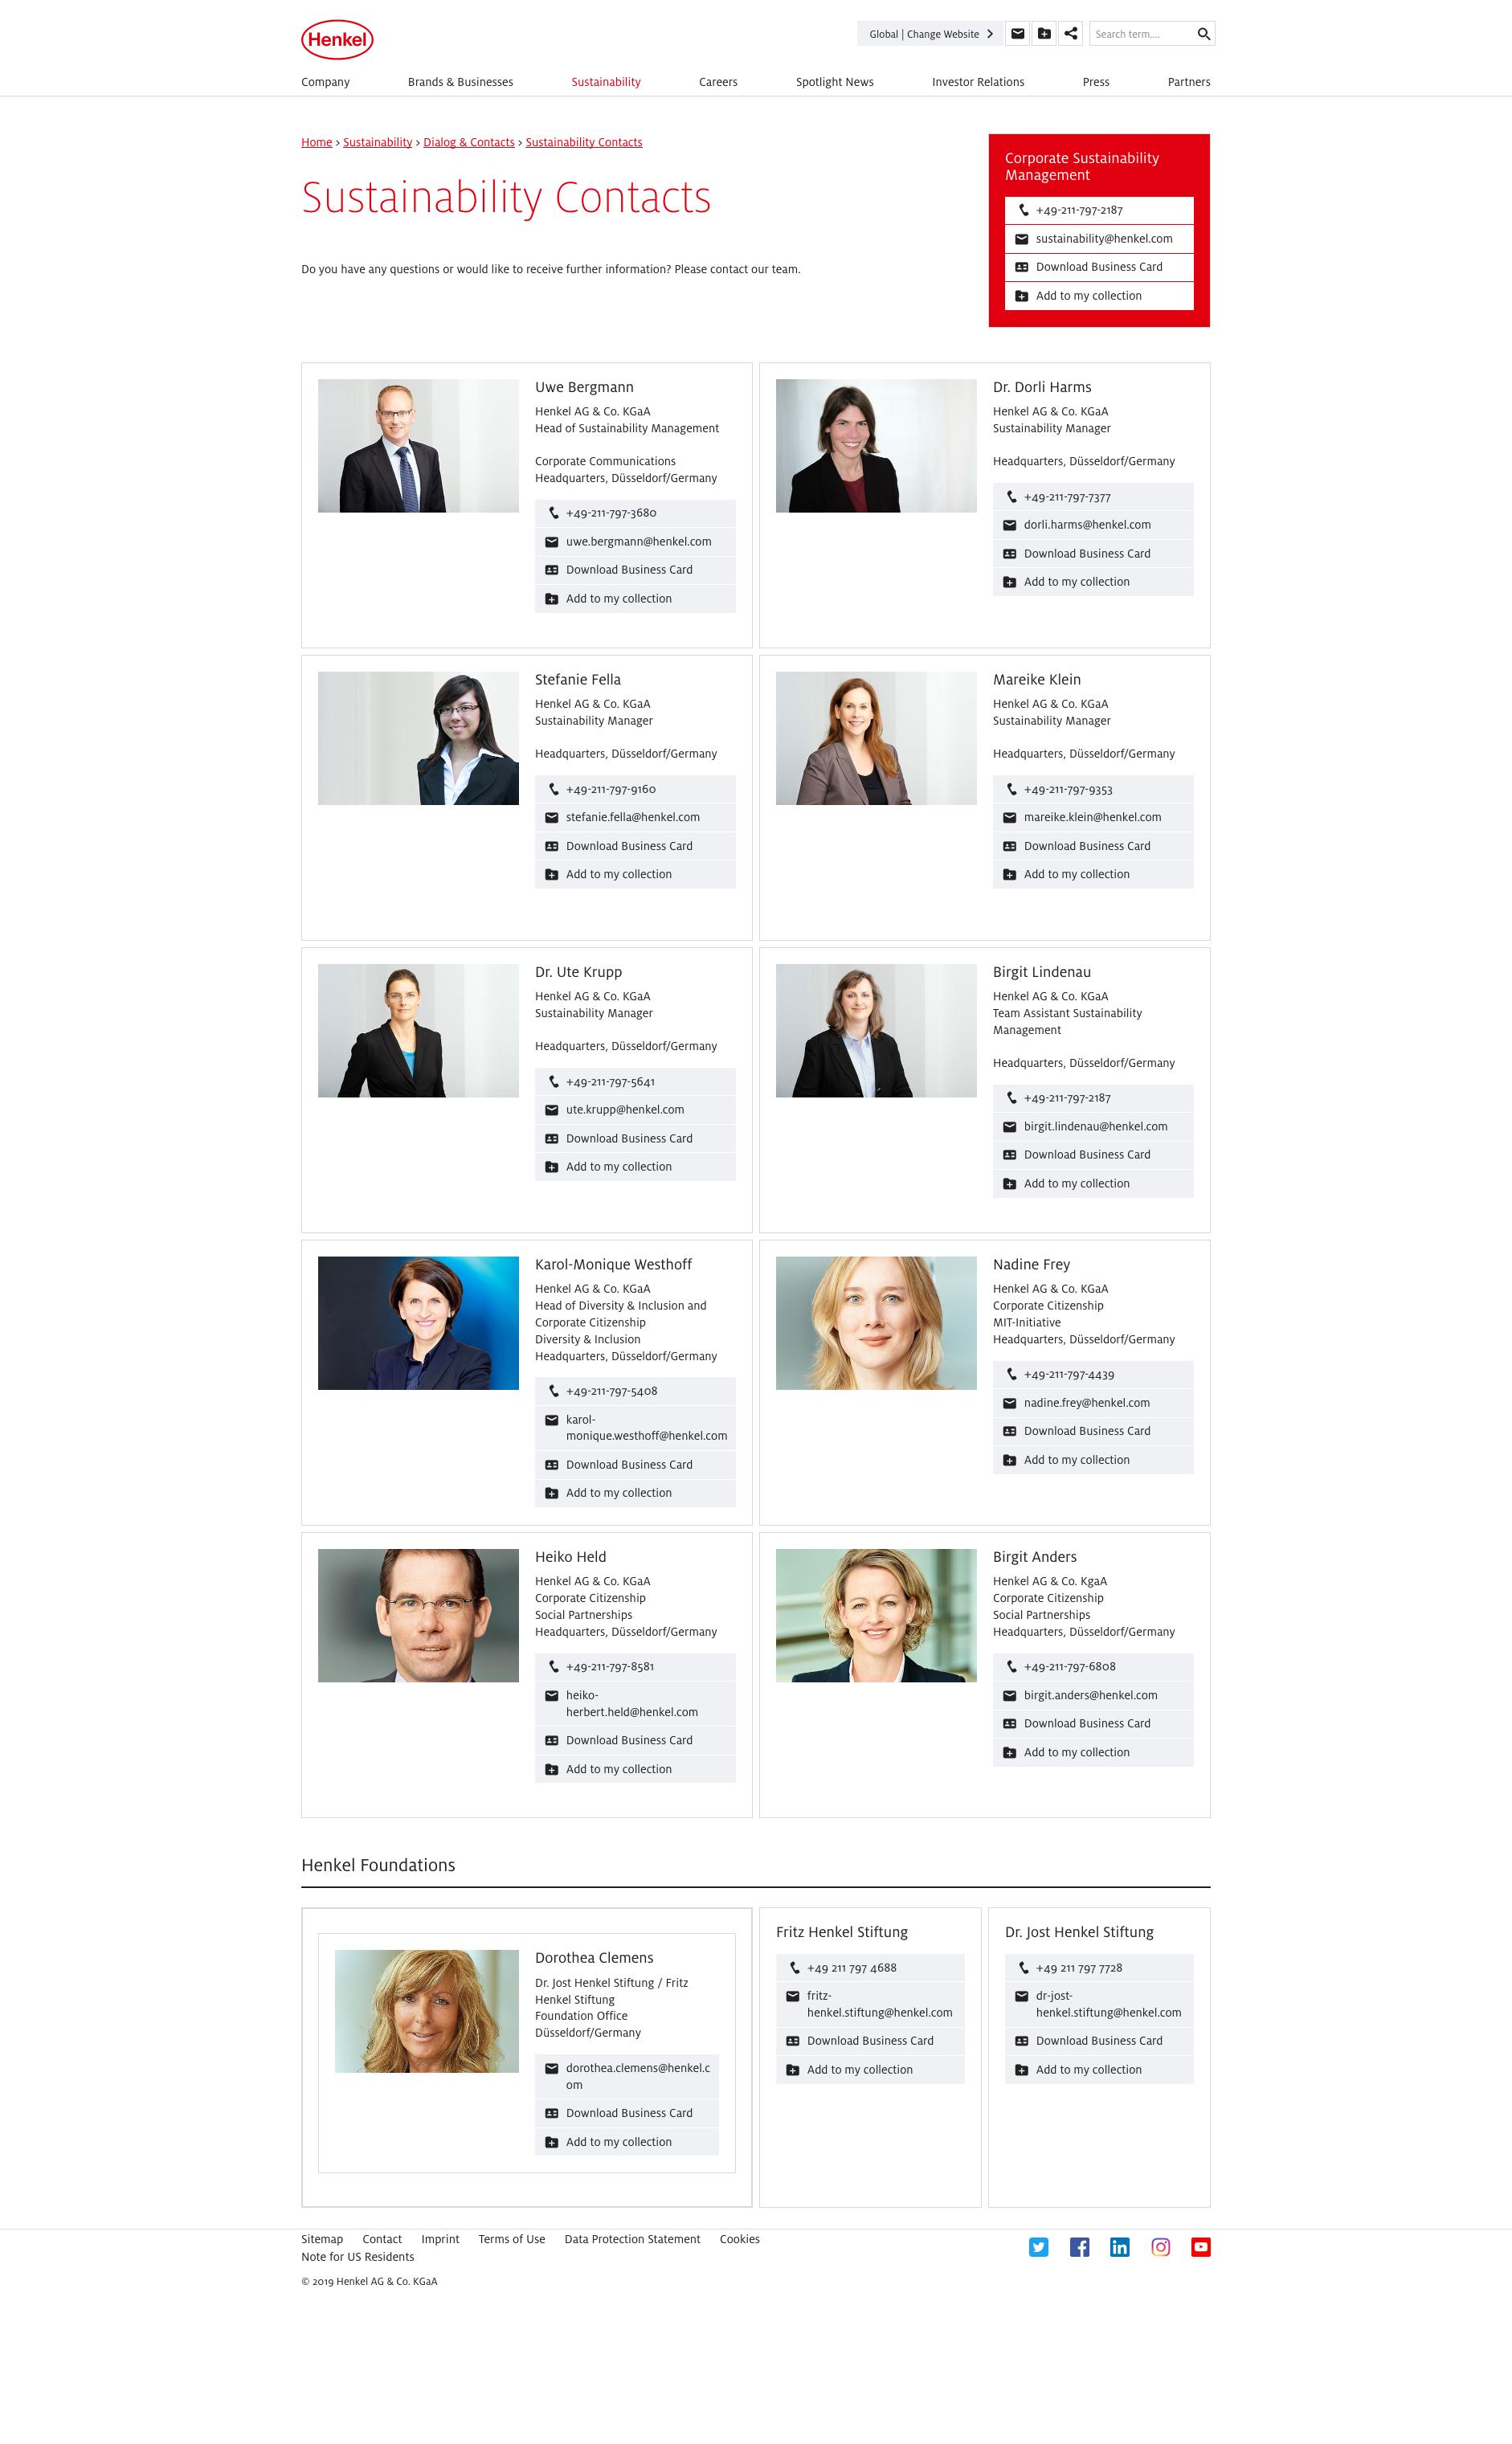 Henkel's CSR contact details are exceptionally comprehensive